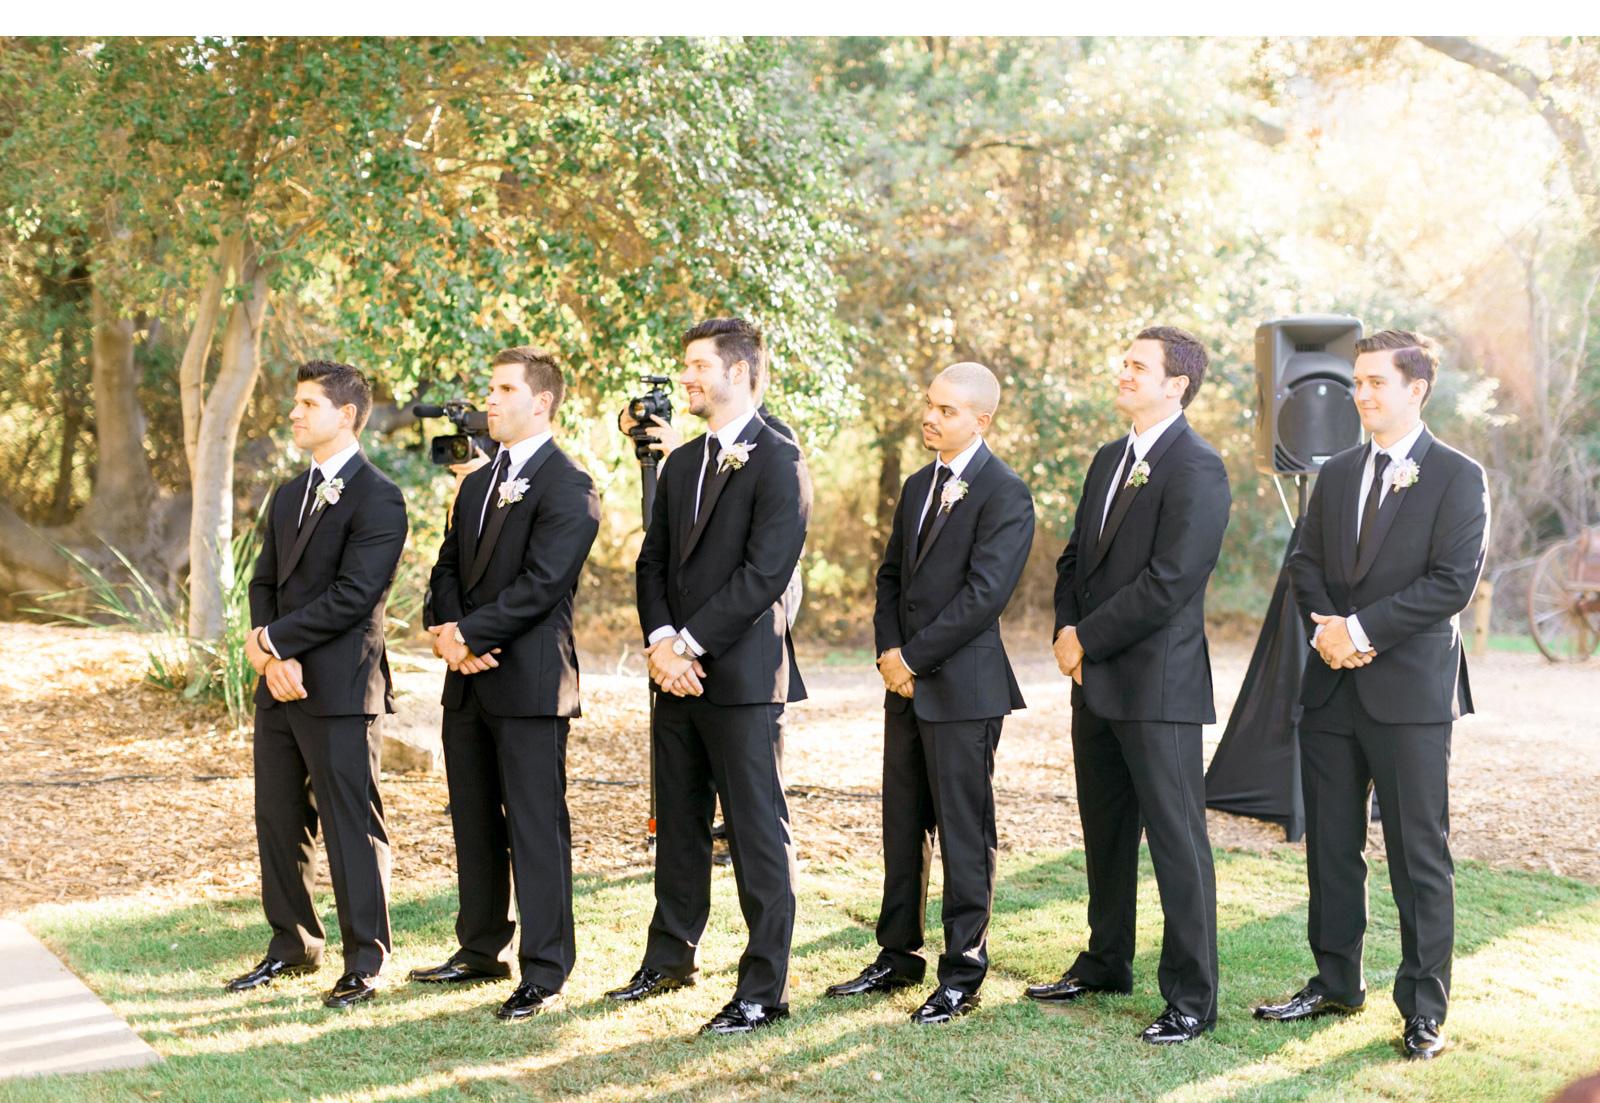 Nia-Sanchez-Wedding-Natalie-Schutt-Photography_09.jpg